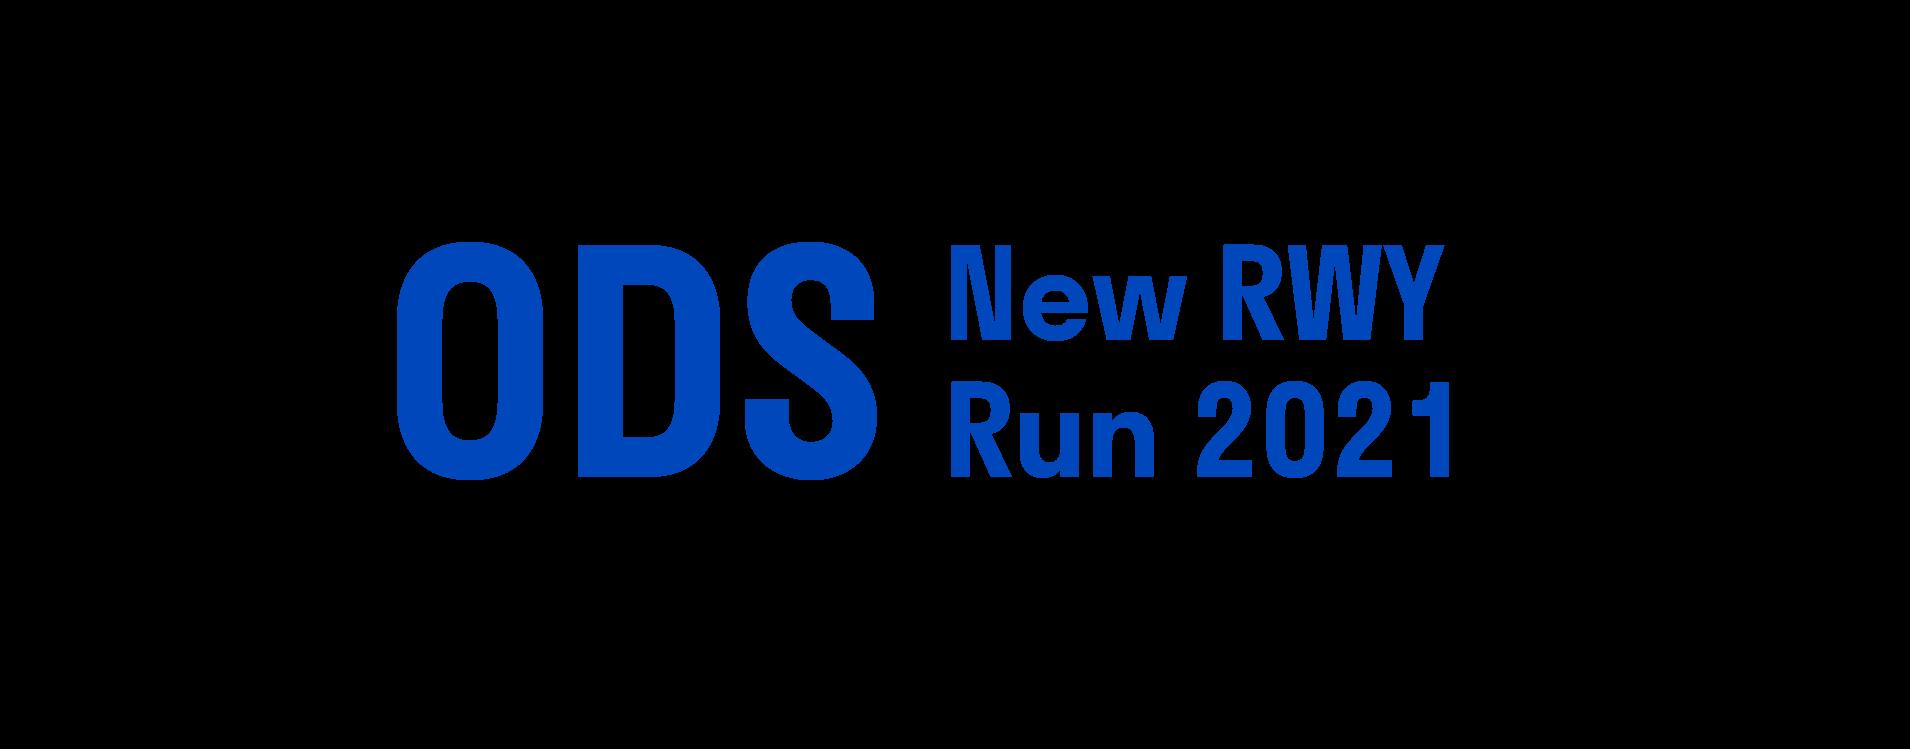 ODS New RWY Run 2021